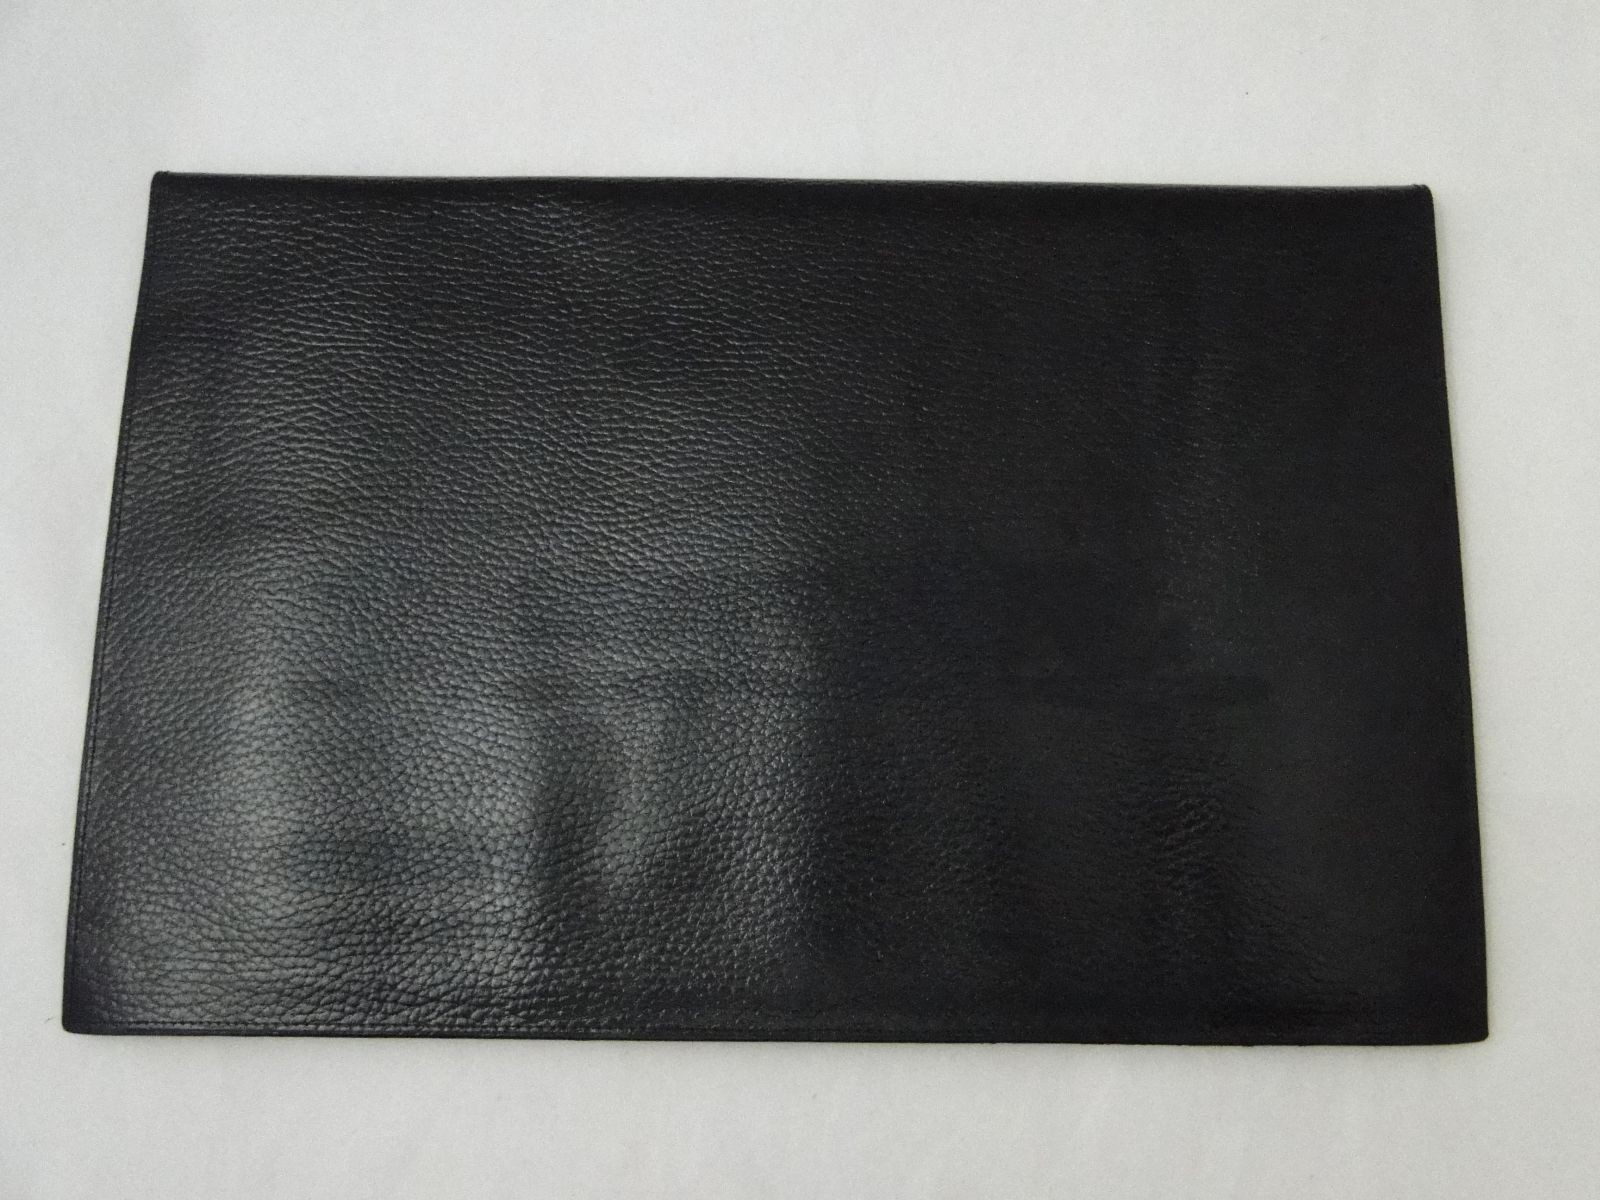 DSC08830.JPG (1600×1200)